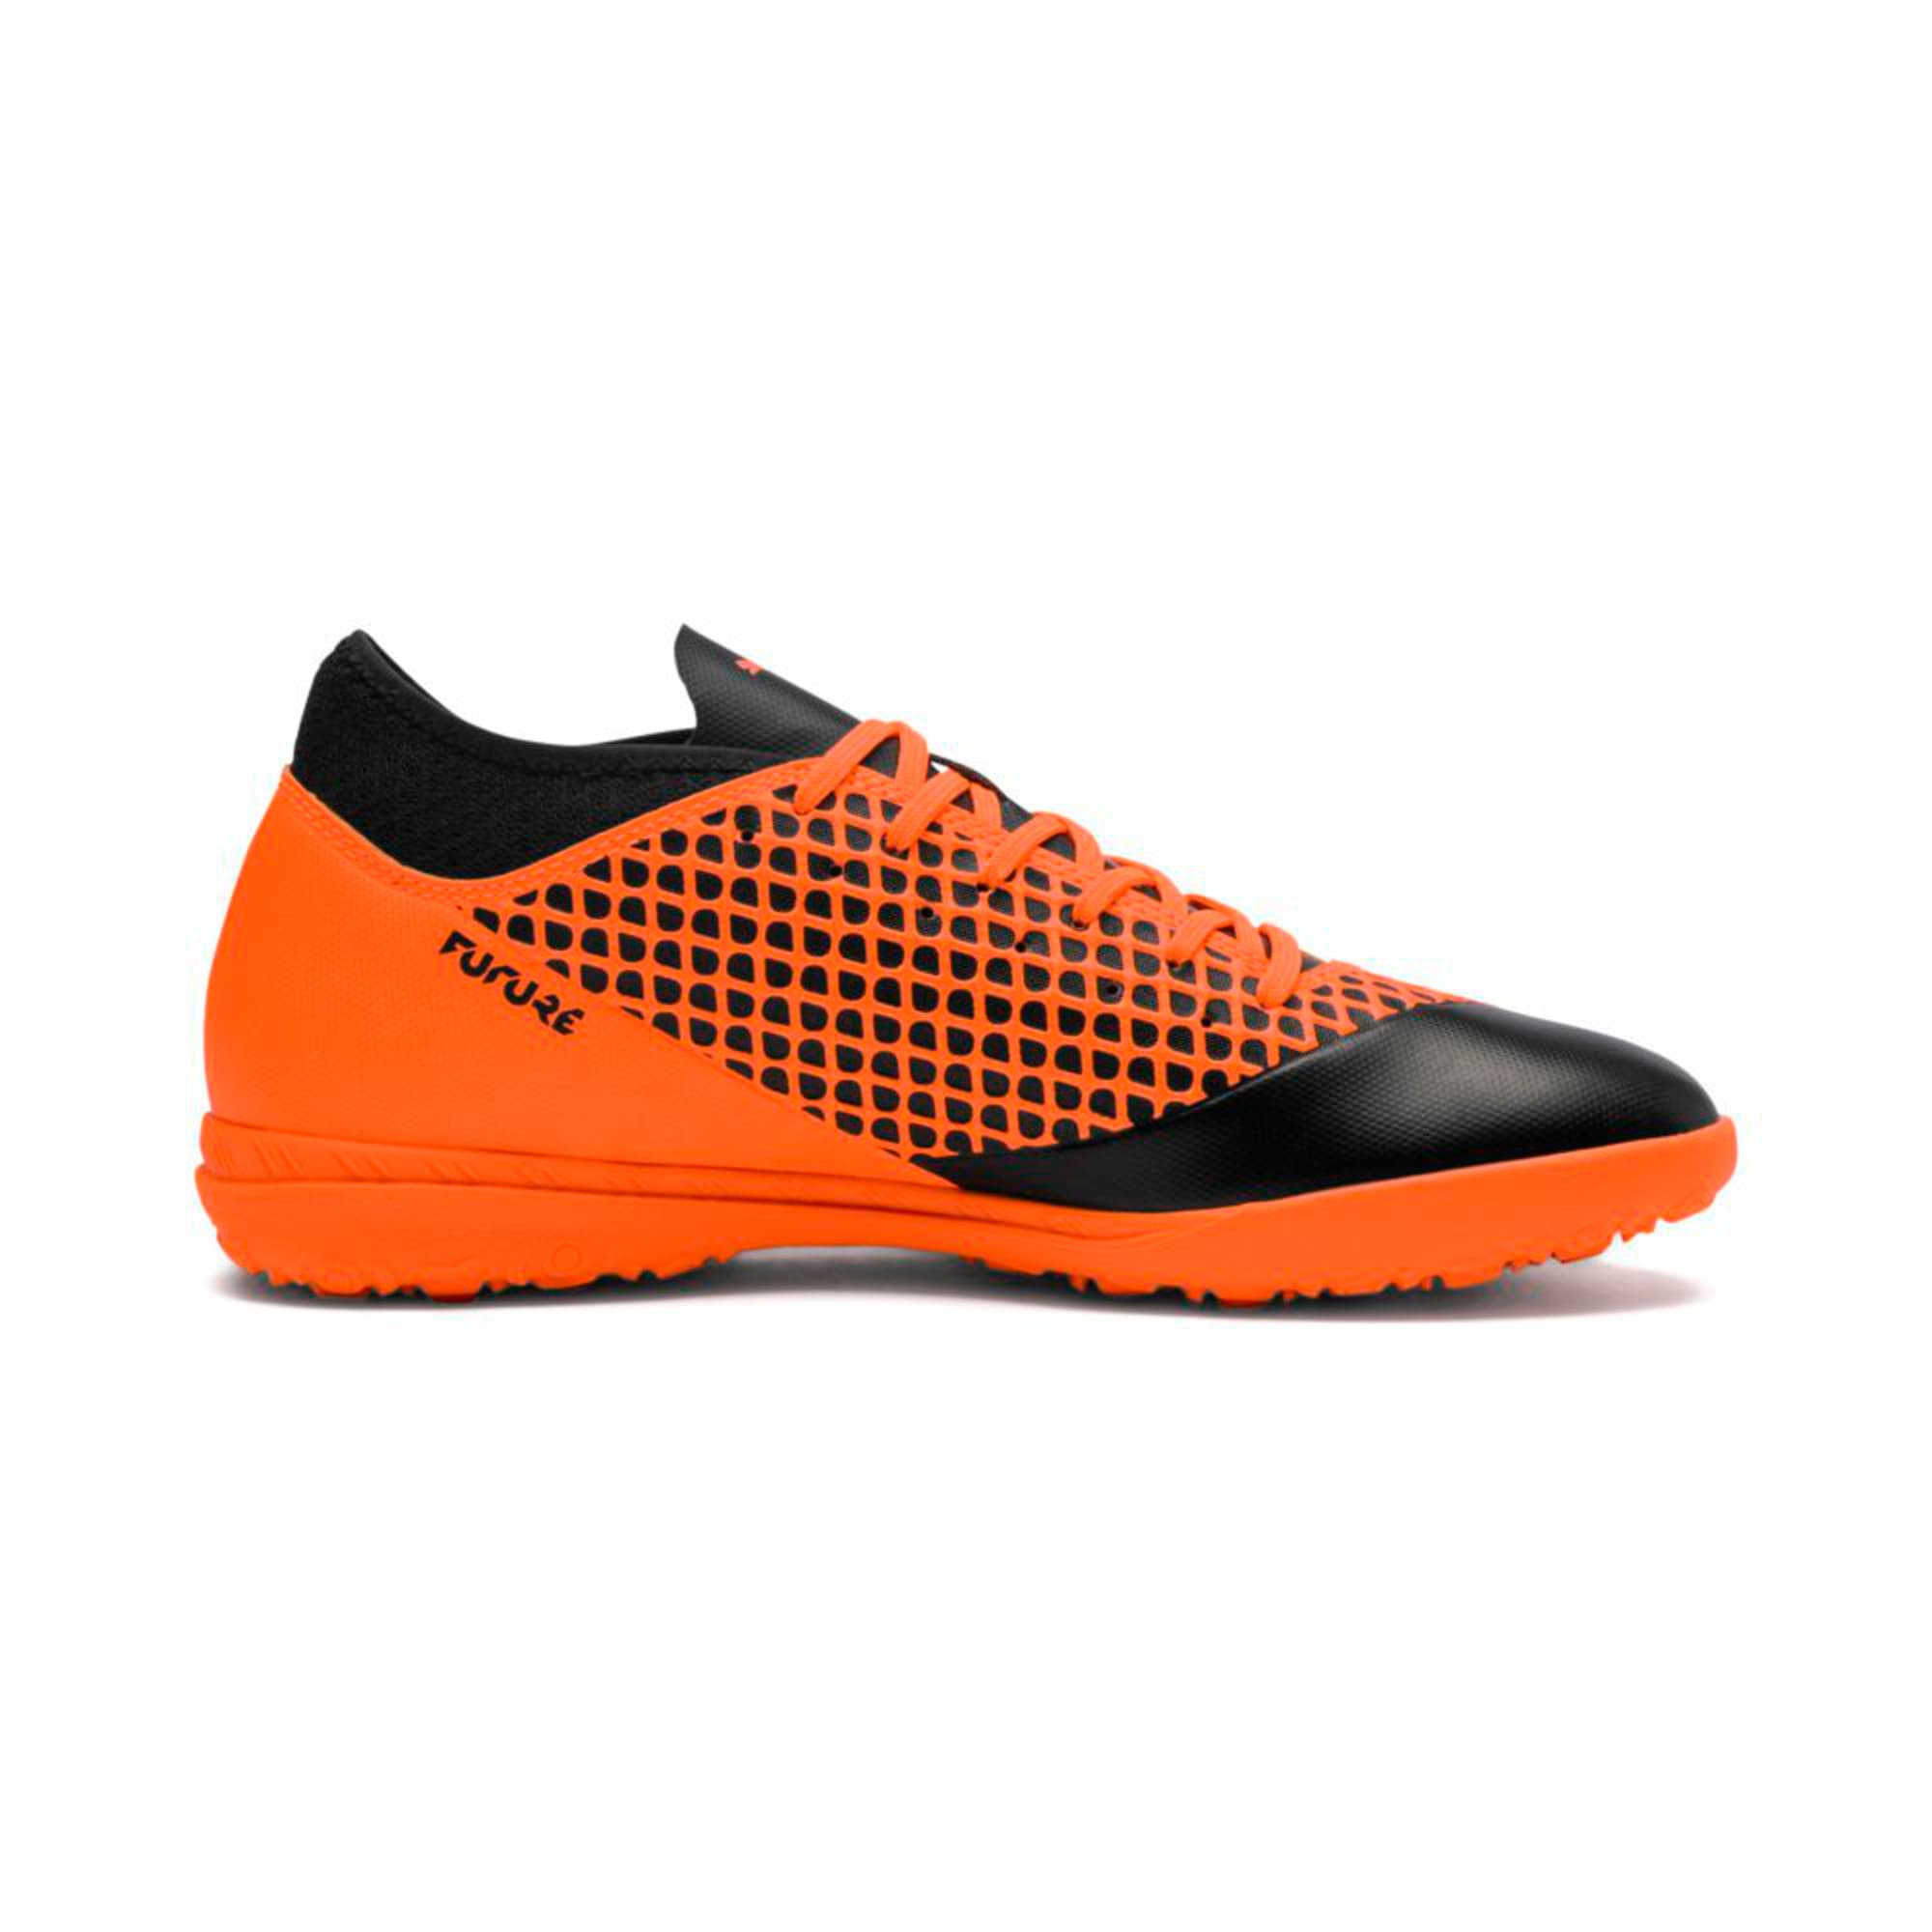 Thumbnail 5 of FUTURE 2.4 TT Men's Football Boots, Puma Black-Shocking Orange, medium-IND